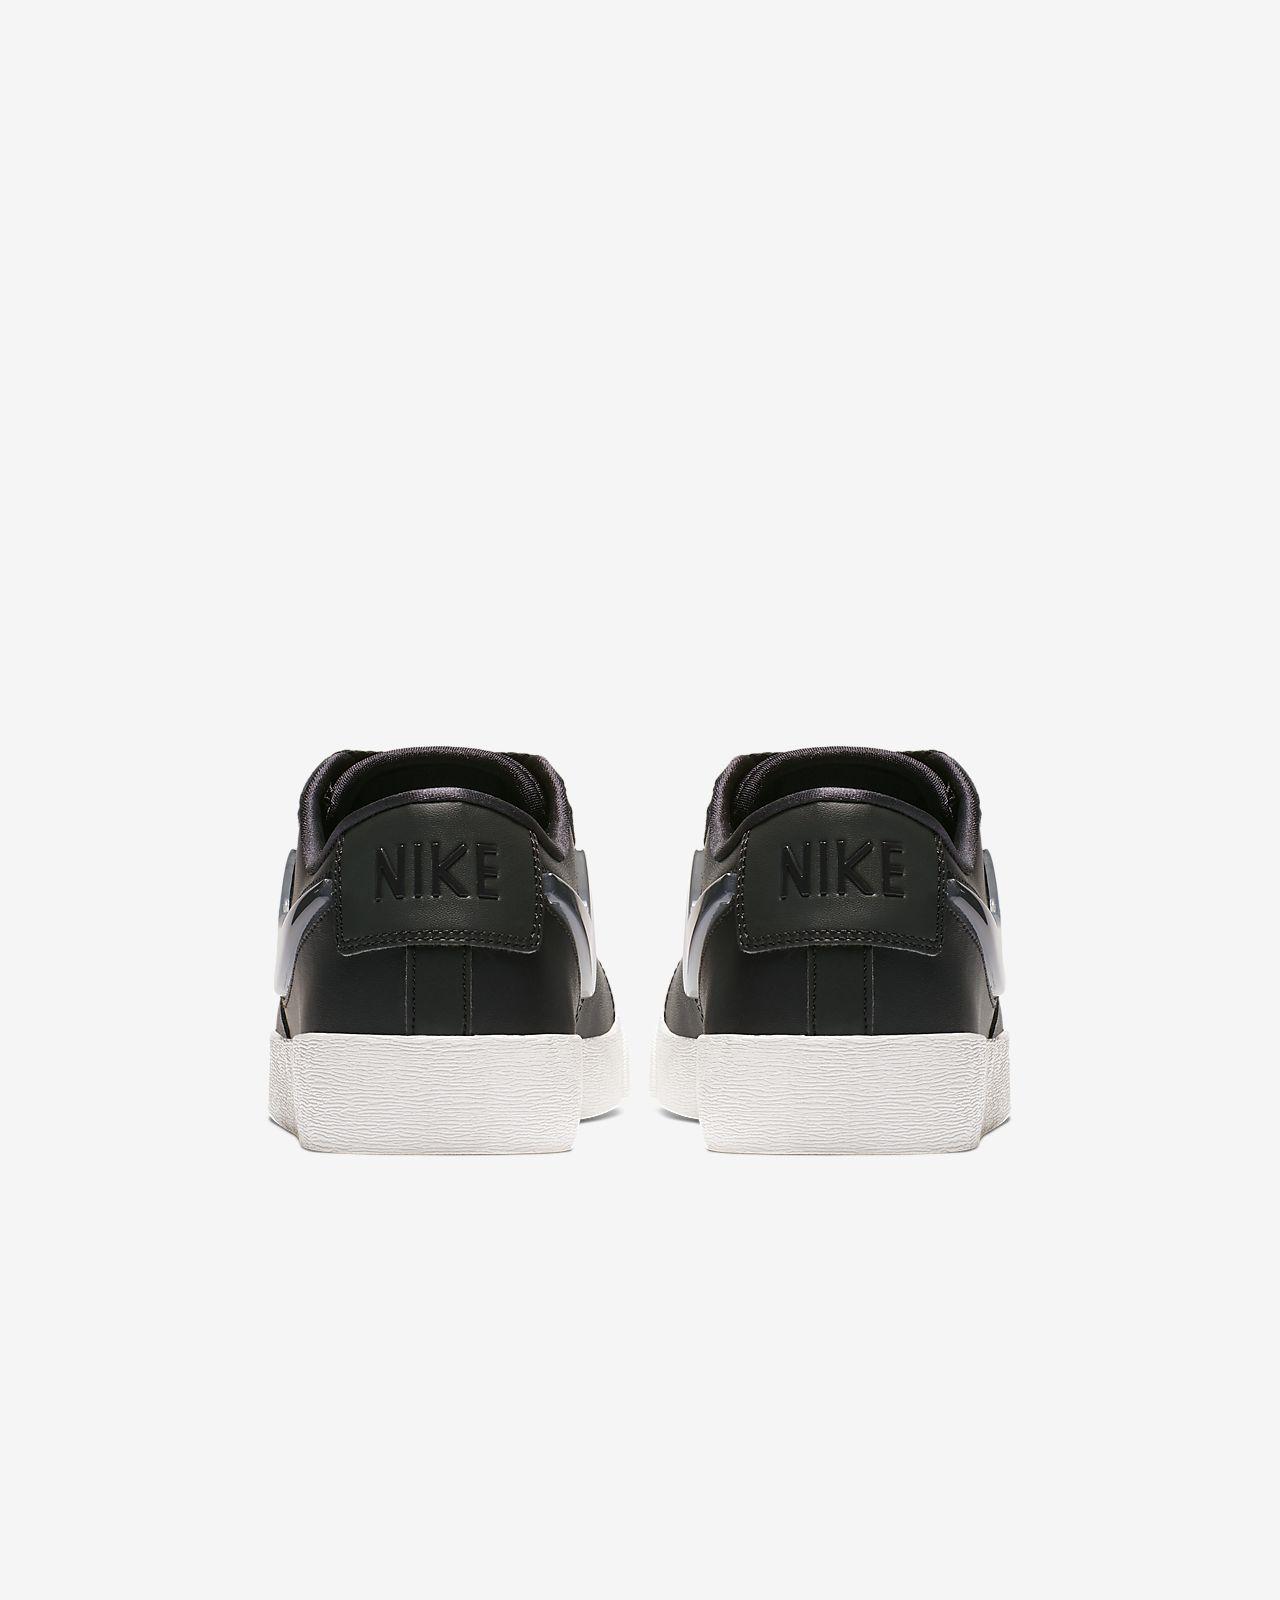 buy popular 2e126 5e78b ... Nike Blazer Low Lux Premium Womens Shoe